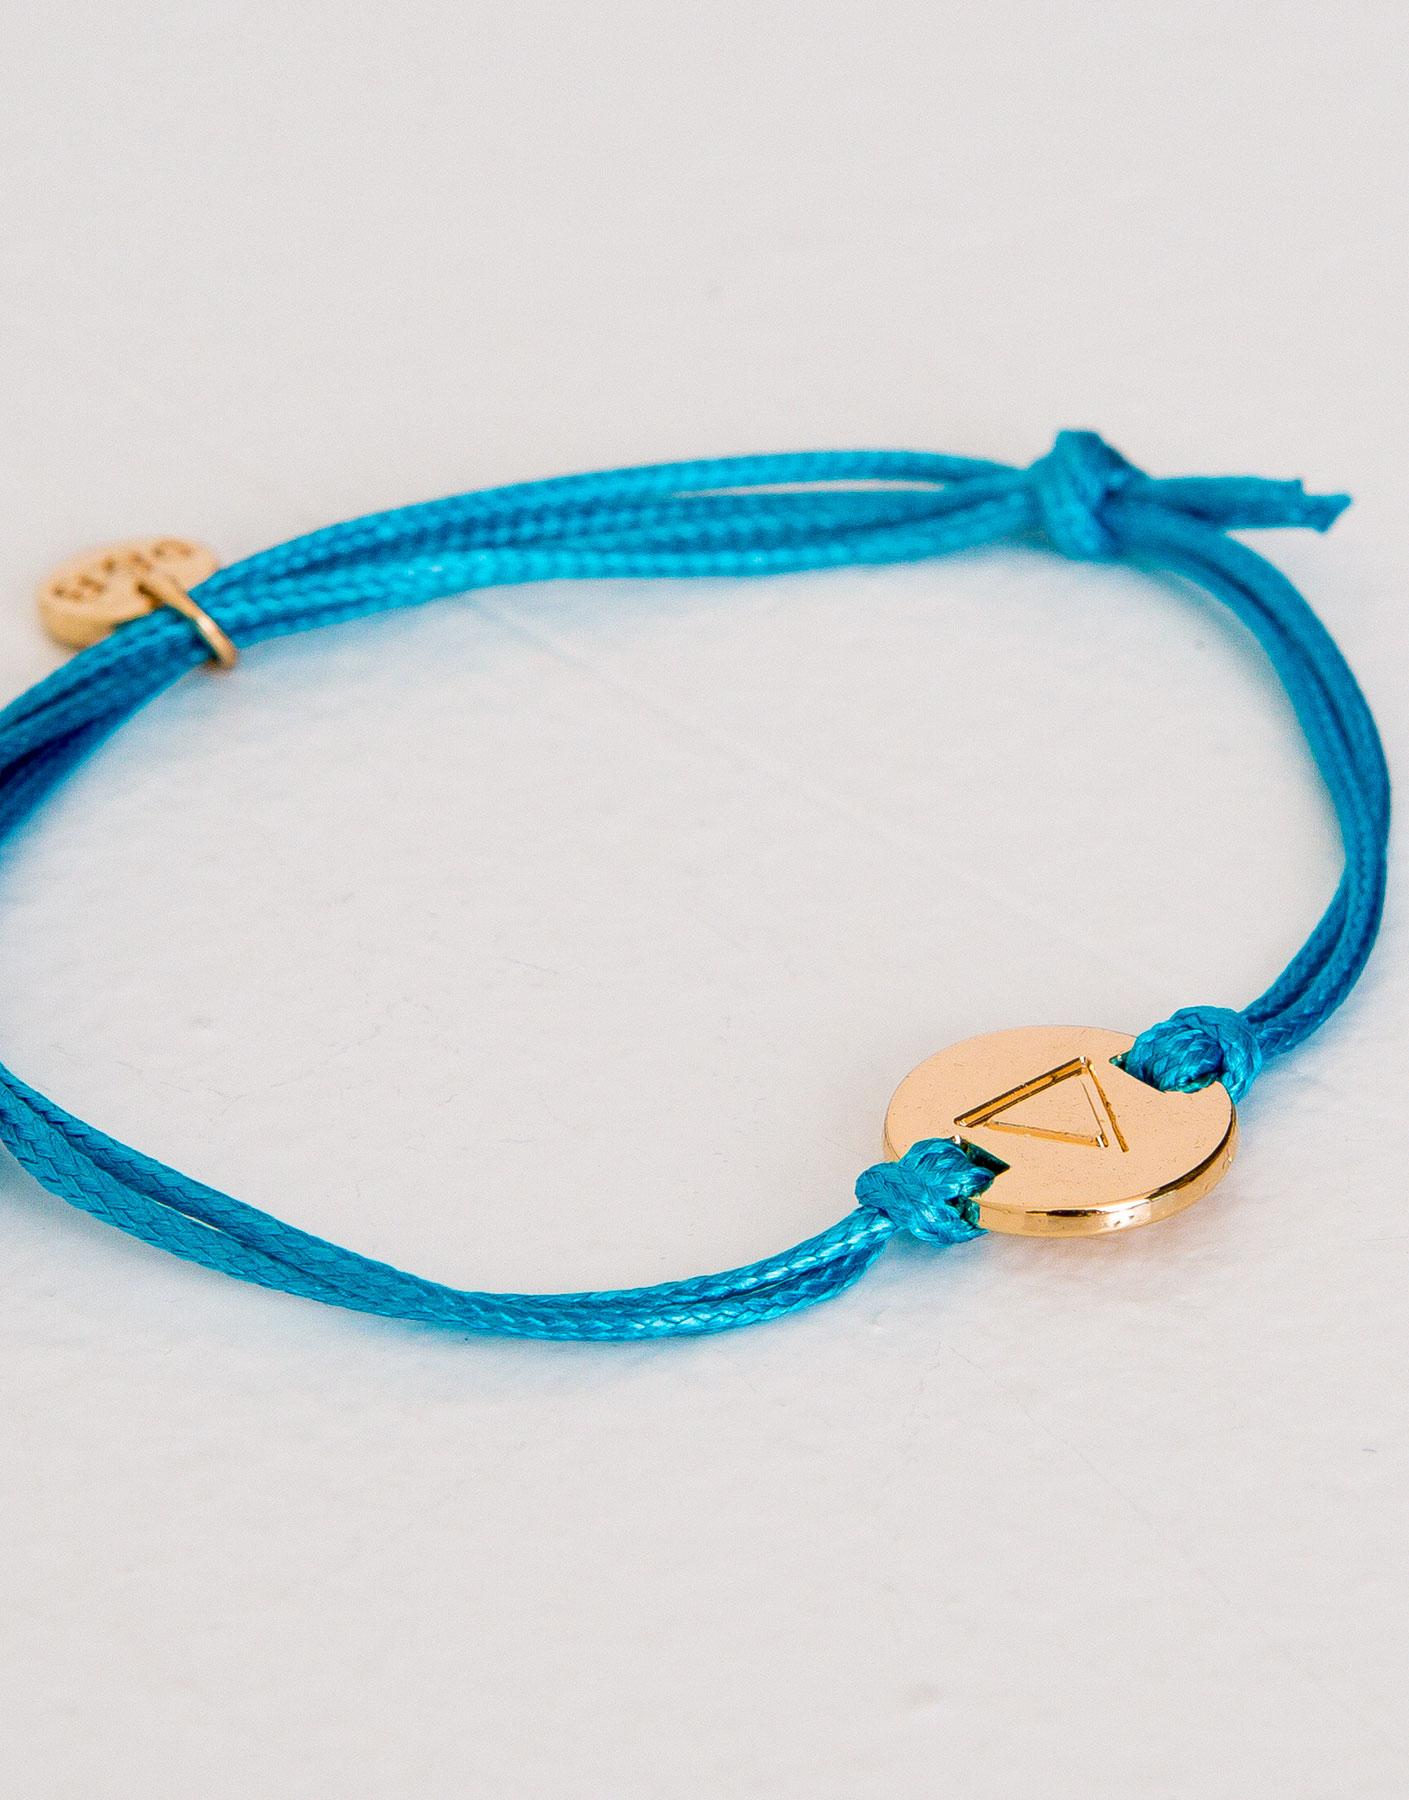 Zodiac water bracelet